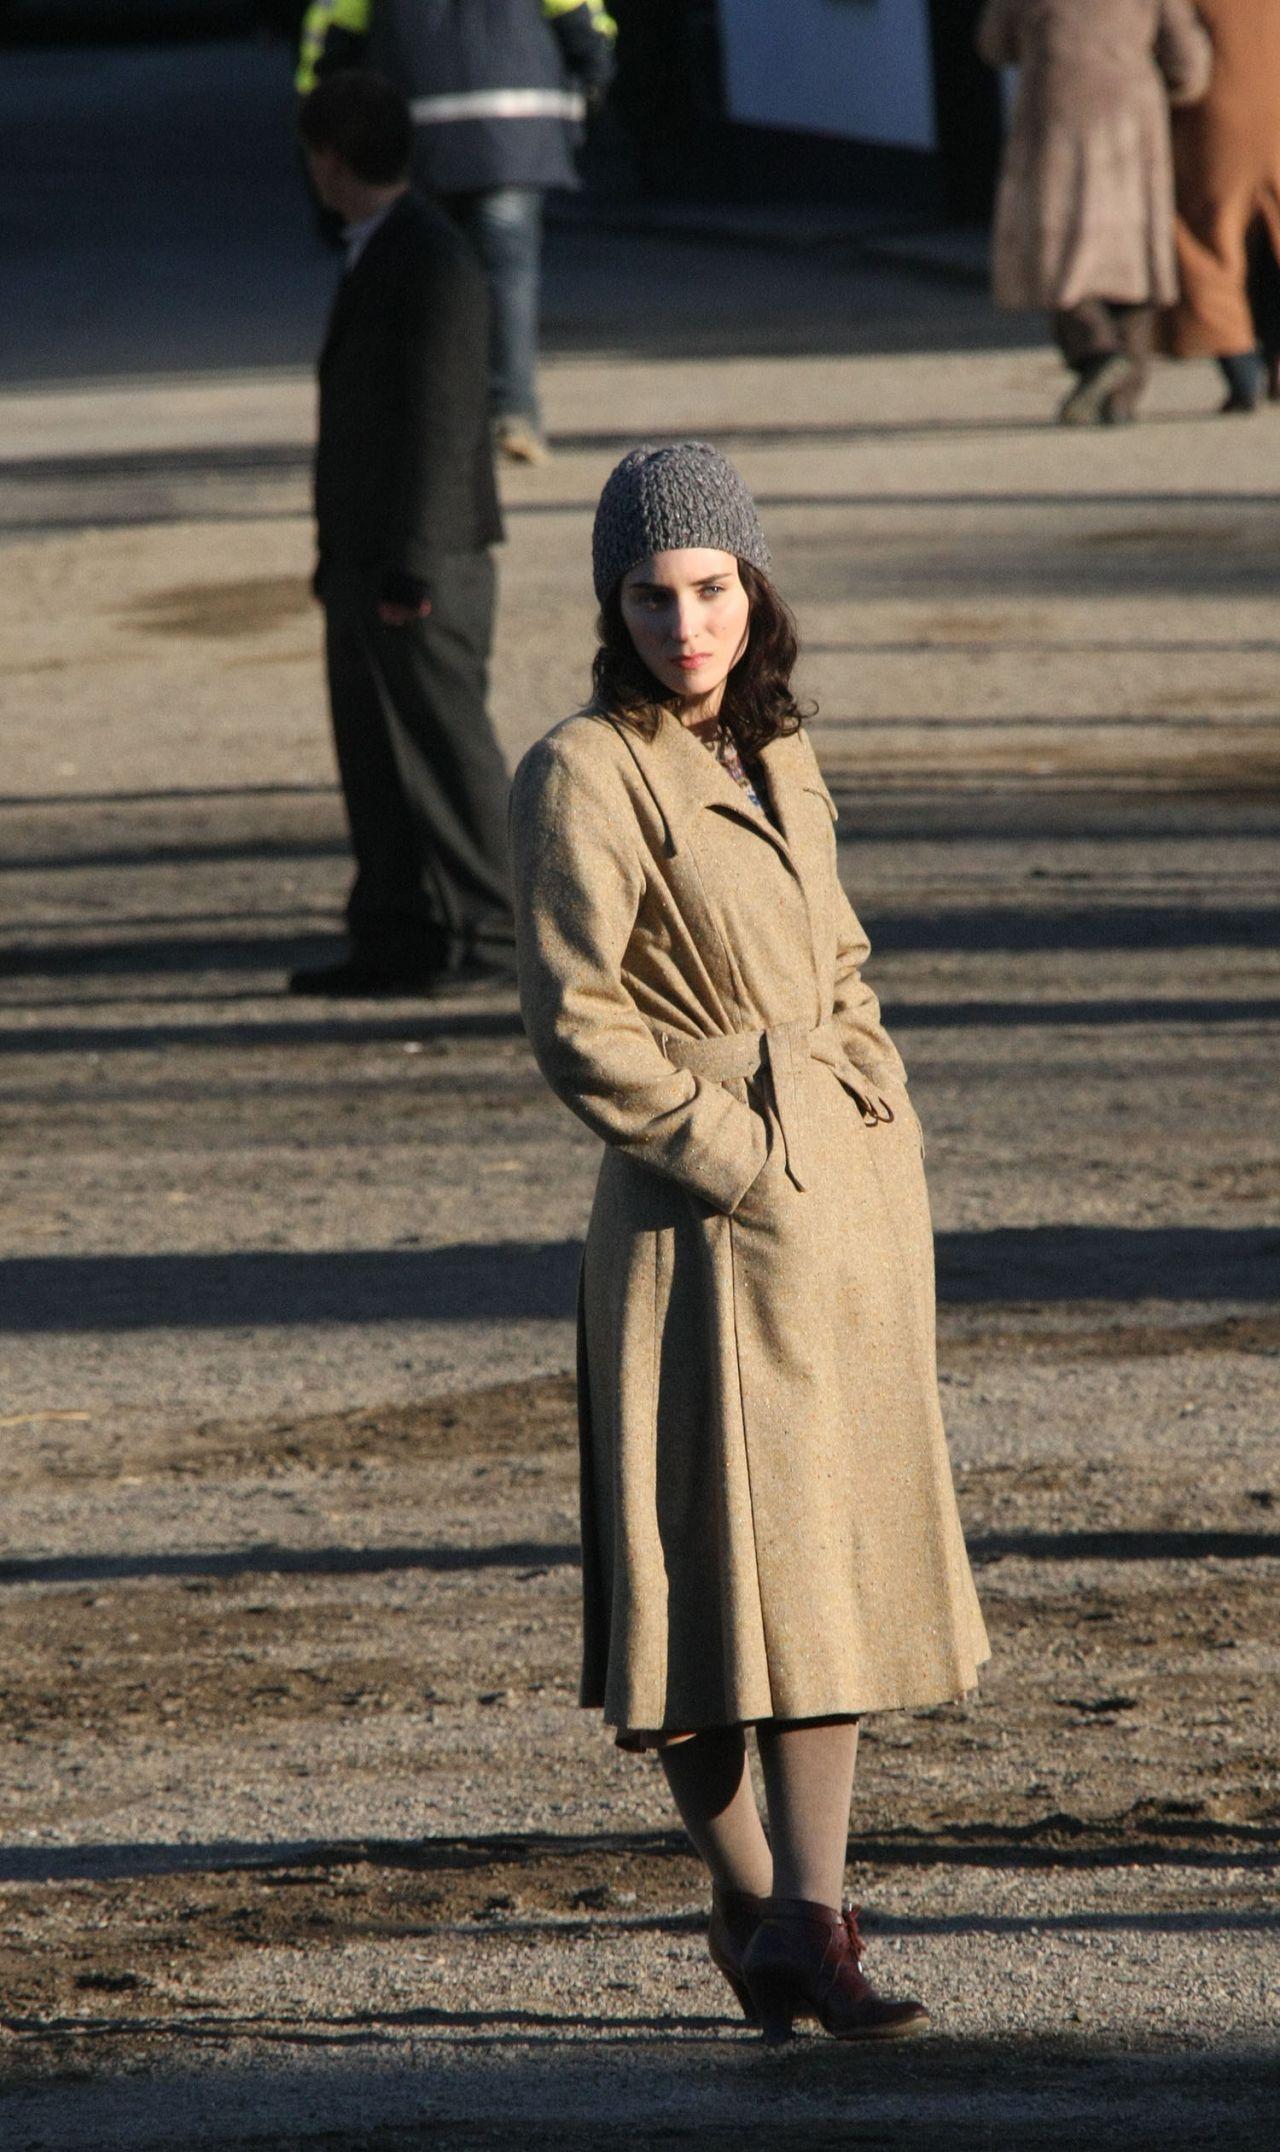 Rooney Mara - On Set of